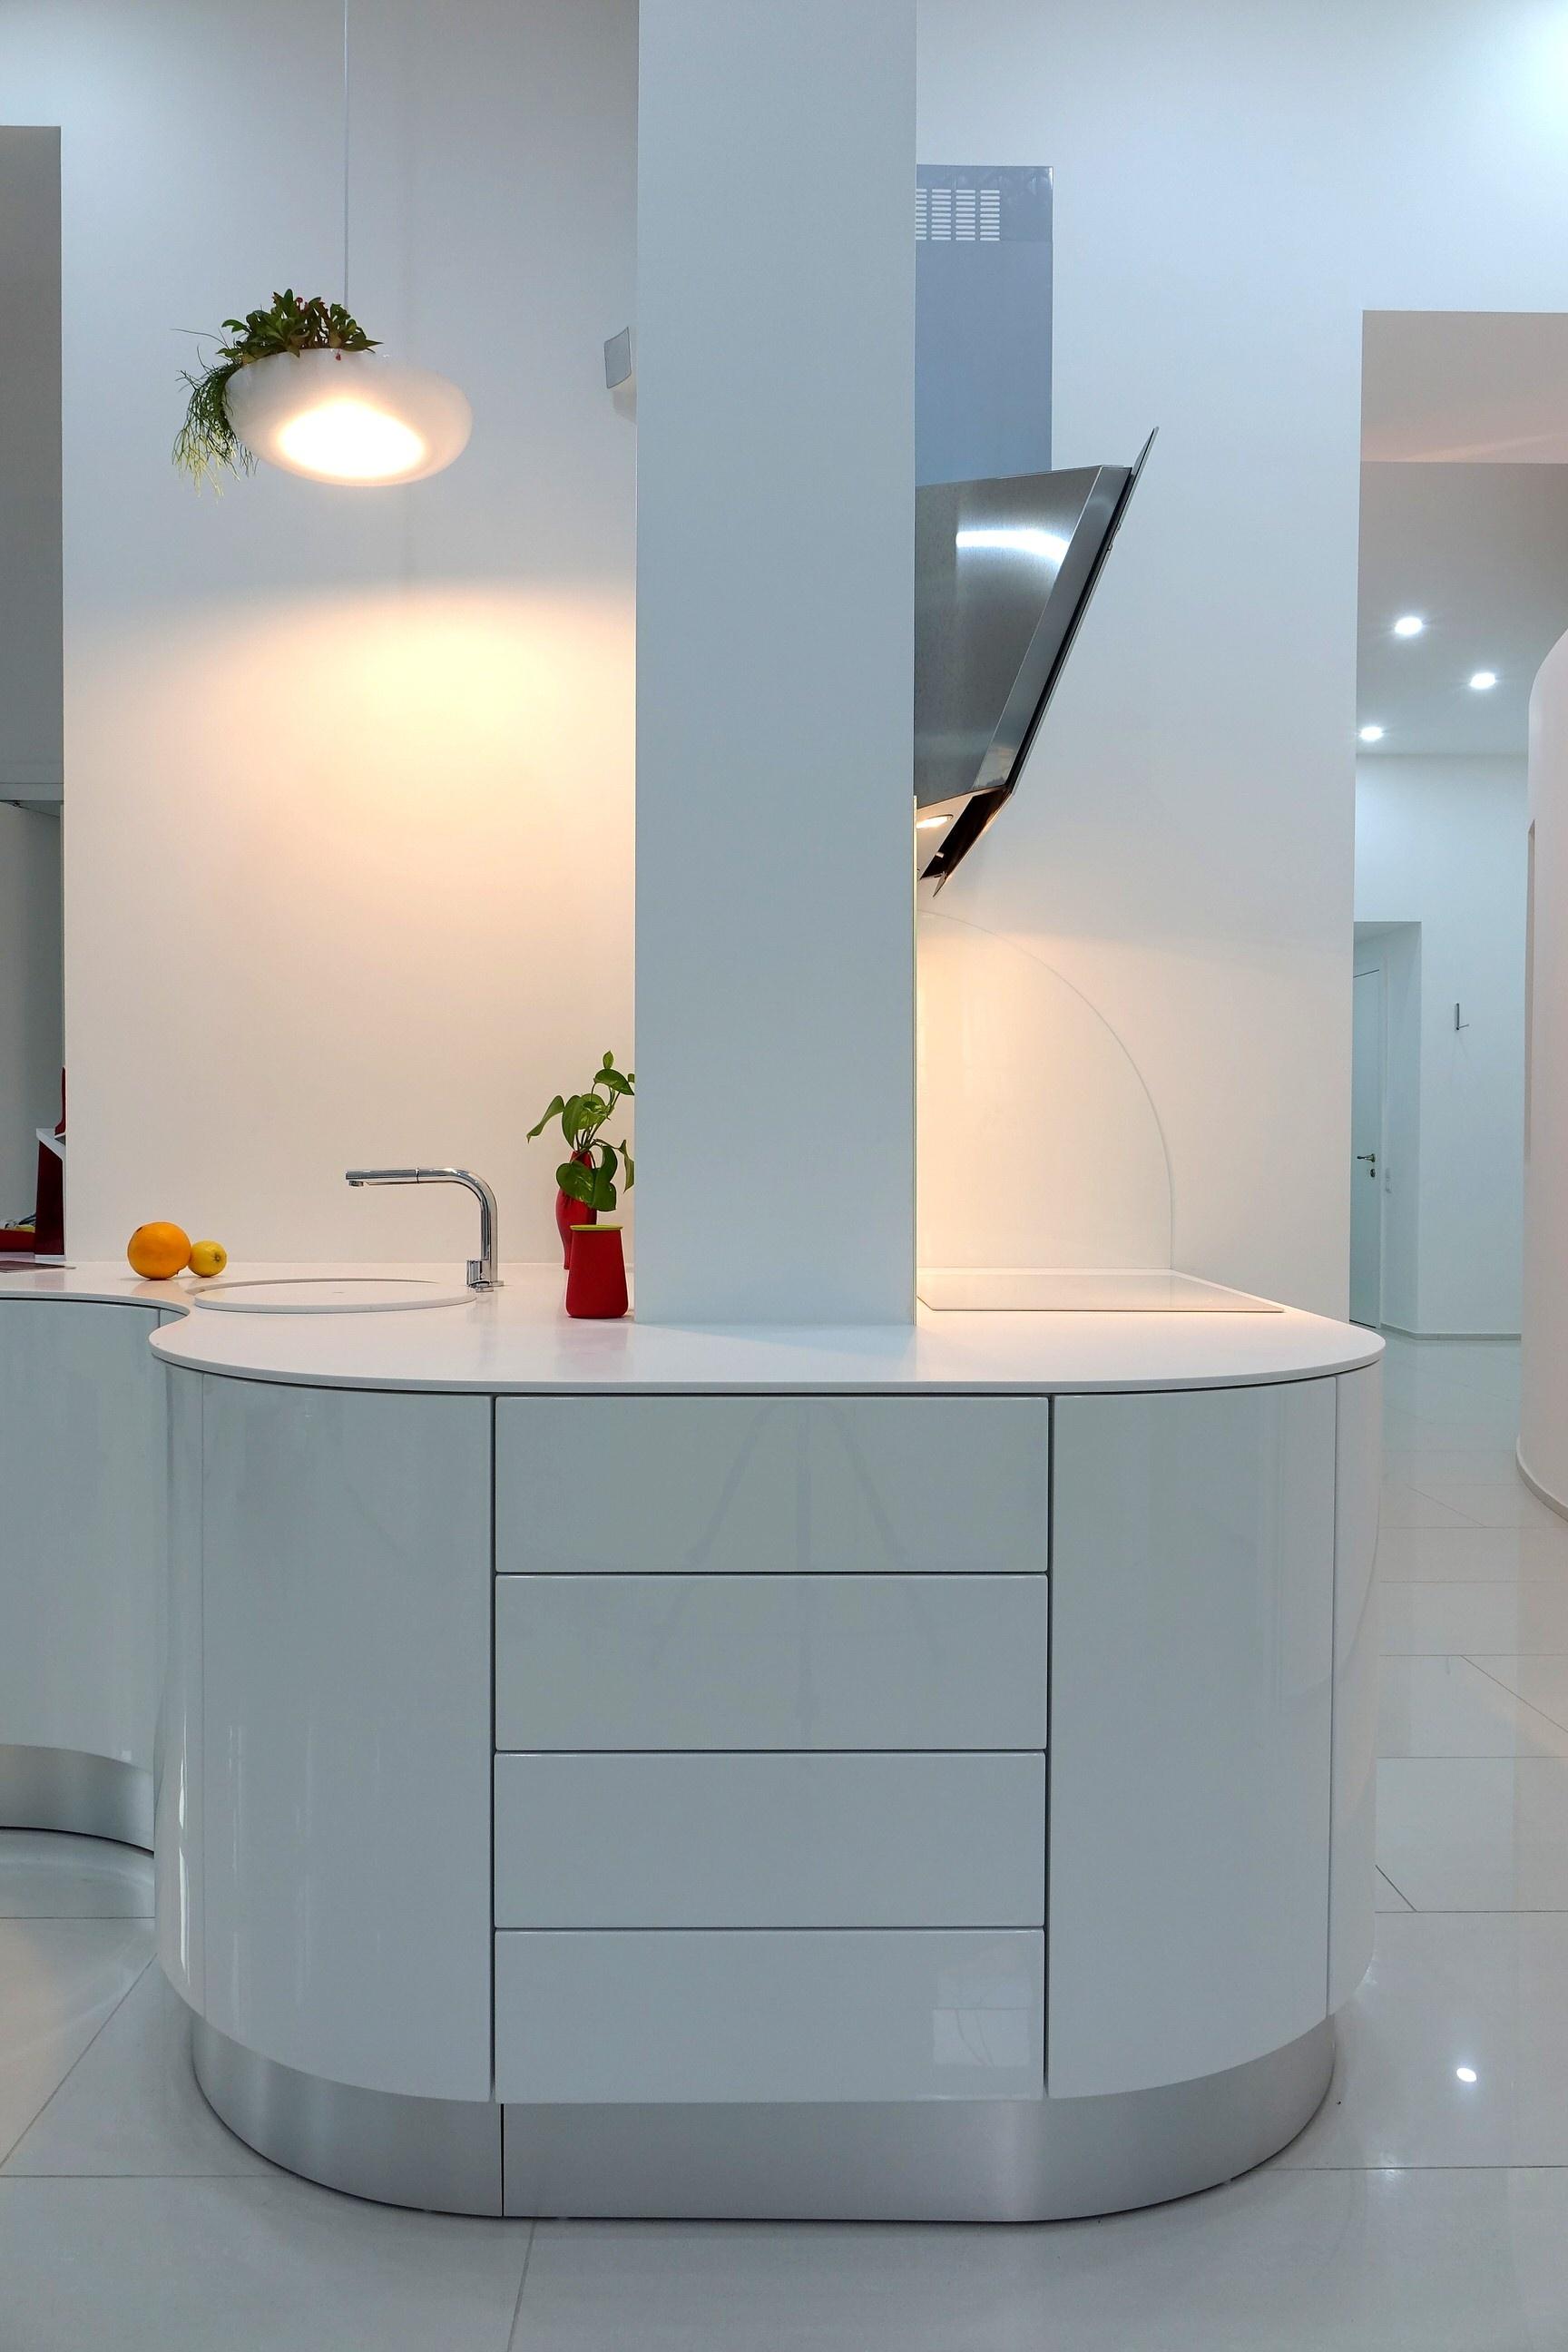 halasz-utca-modern-design-apartment-budapest-dsc00419_filtered_01